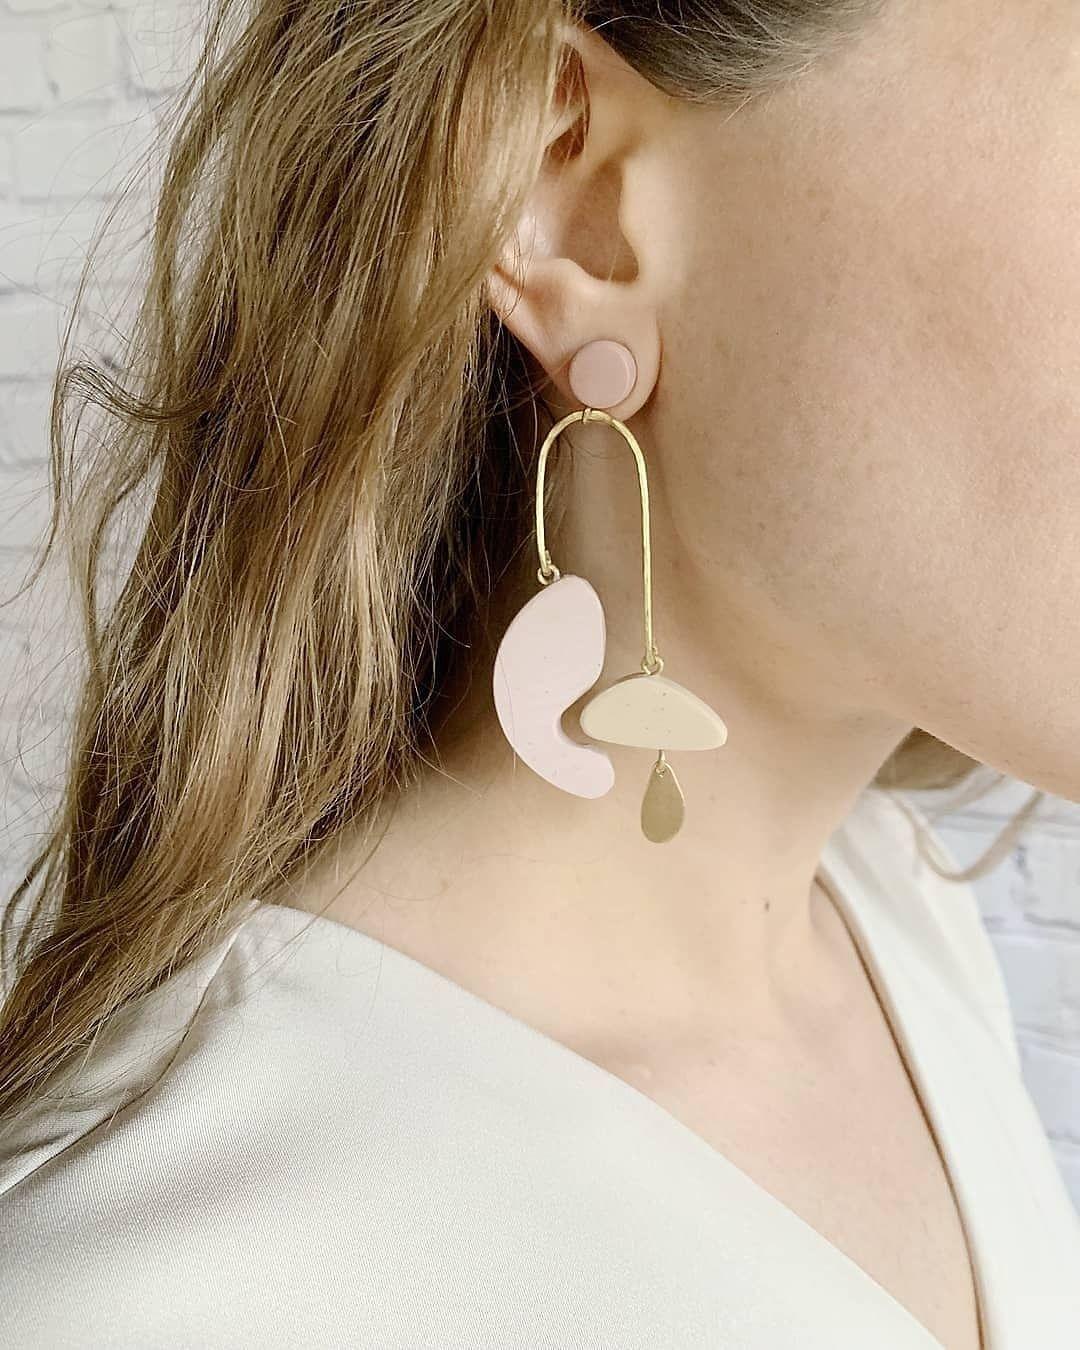 Polymer Clay Statement Earrings The Hattie